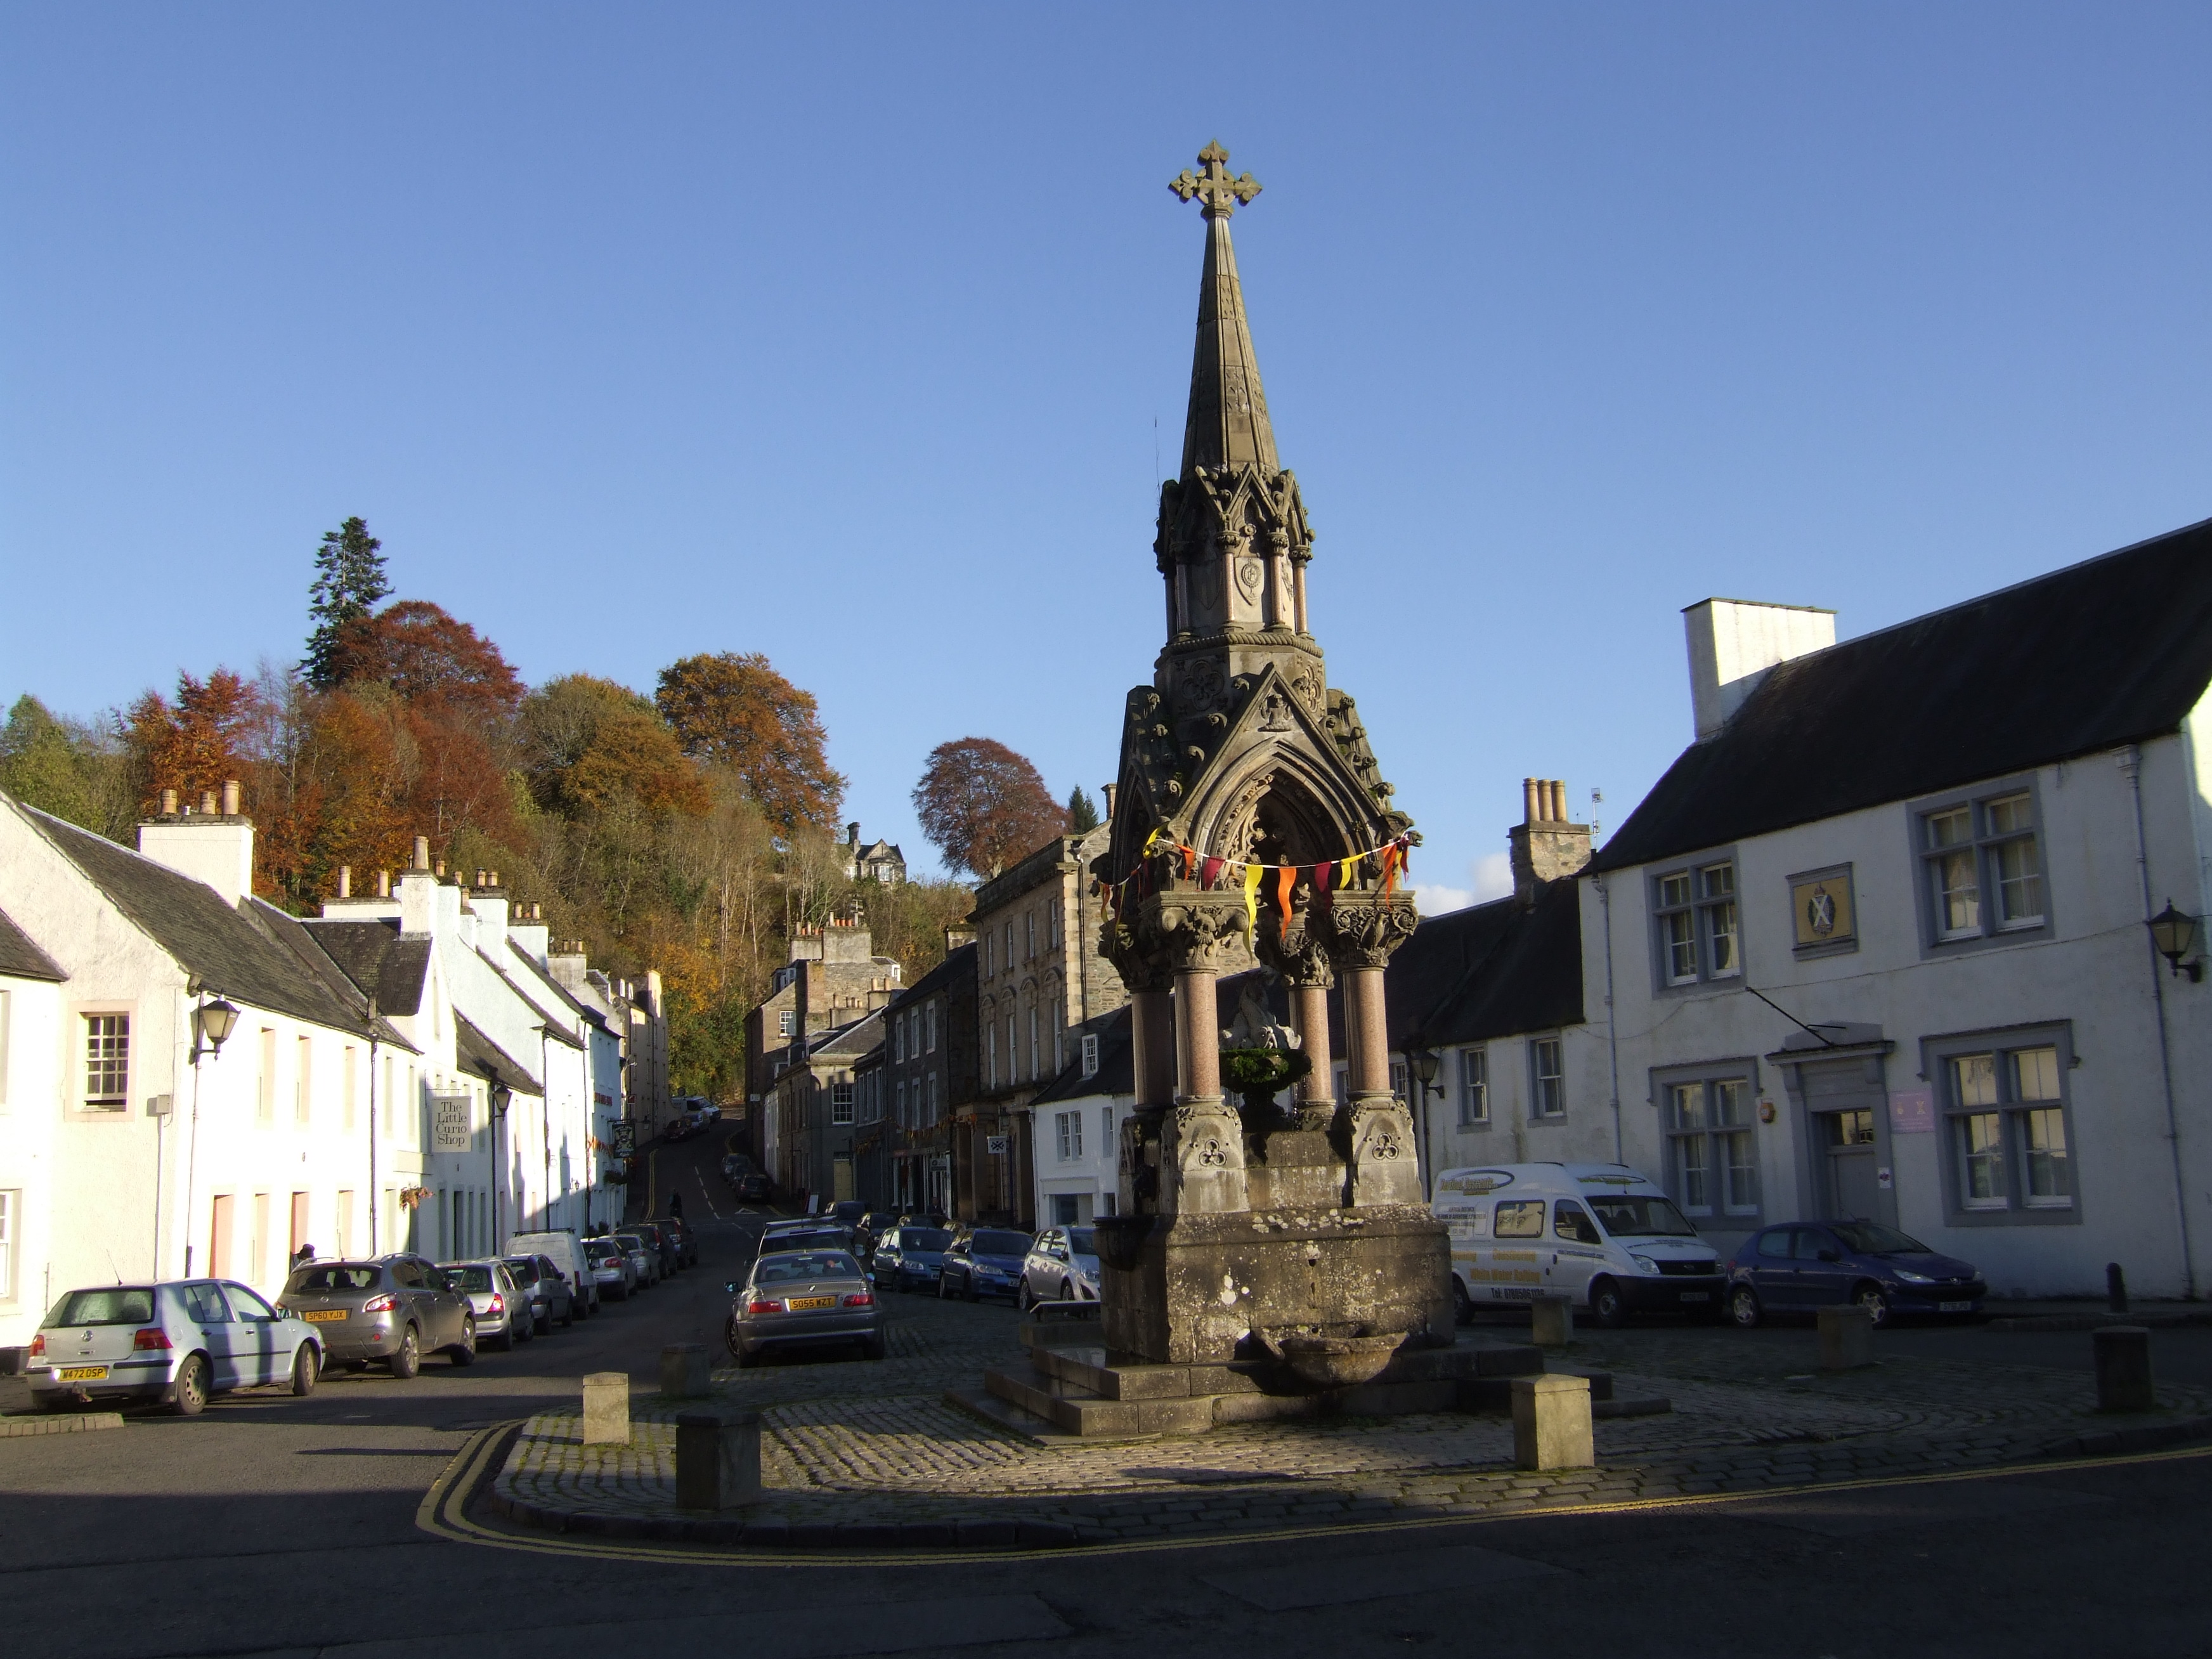 Dunkeld Town Square